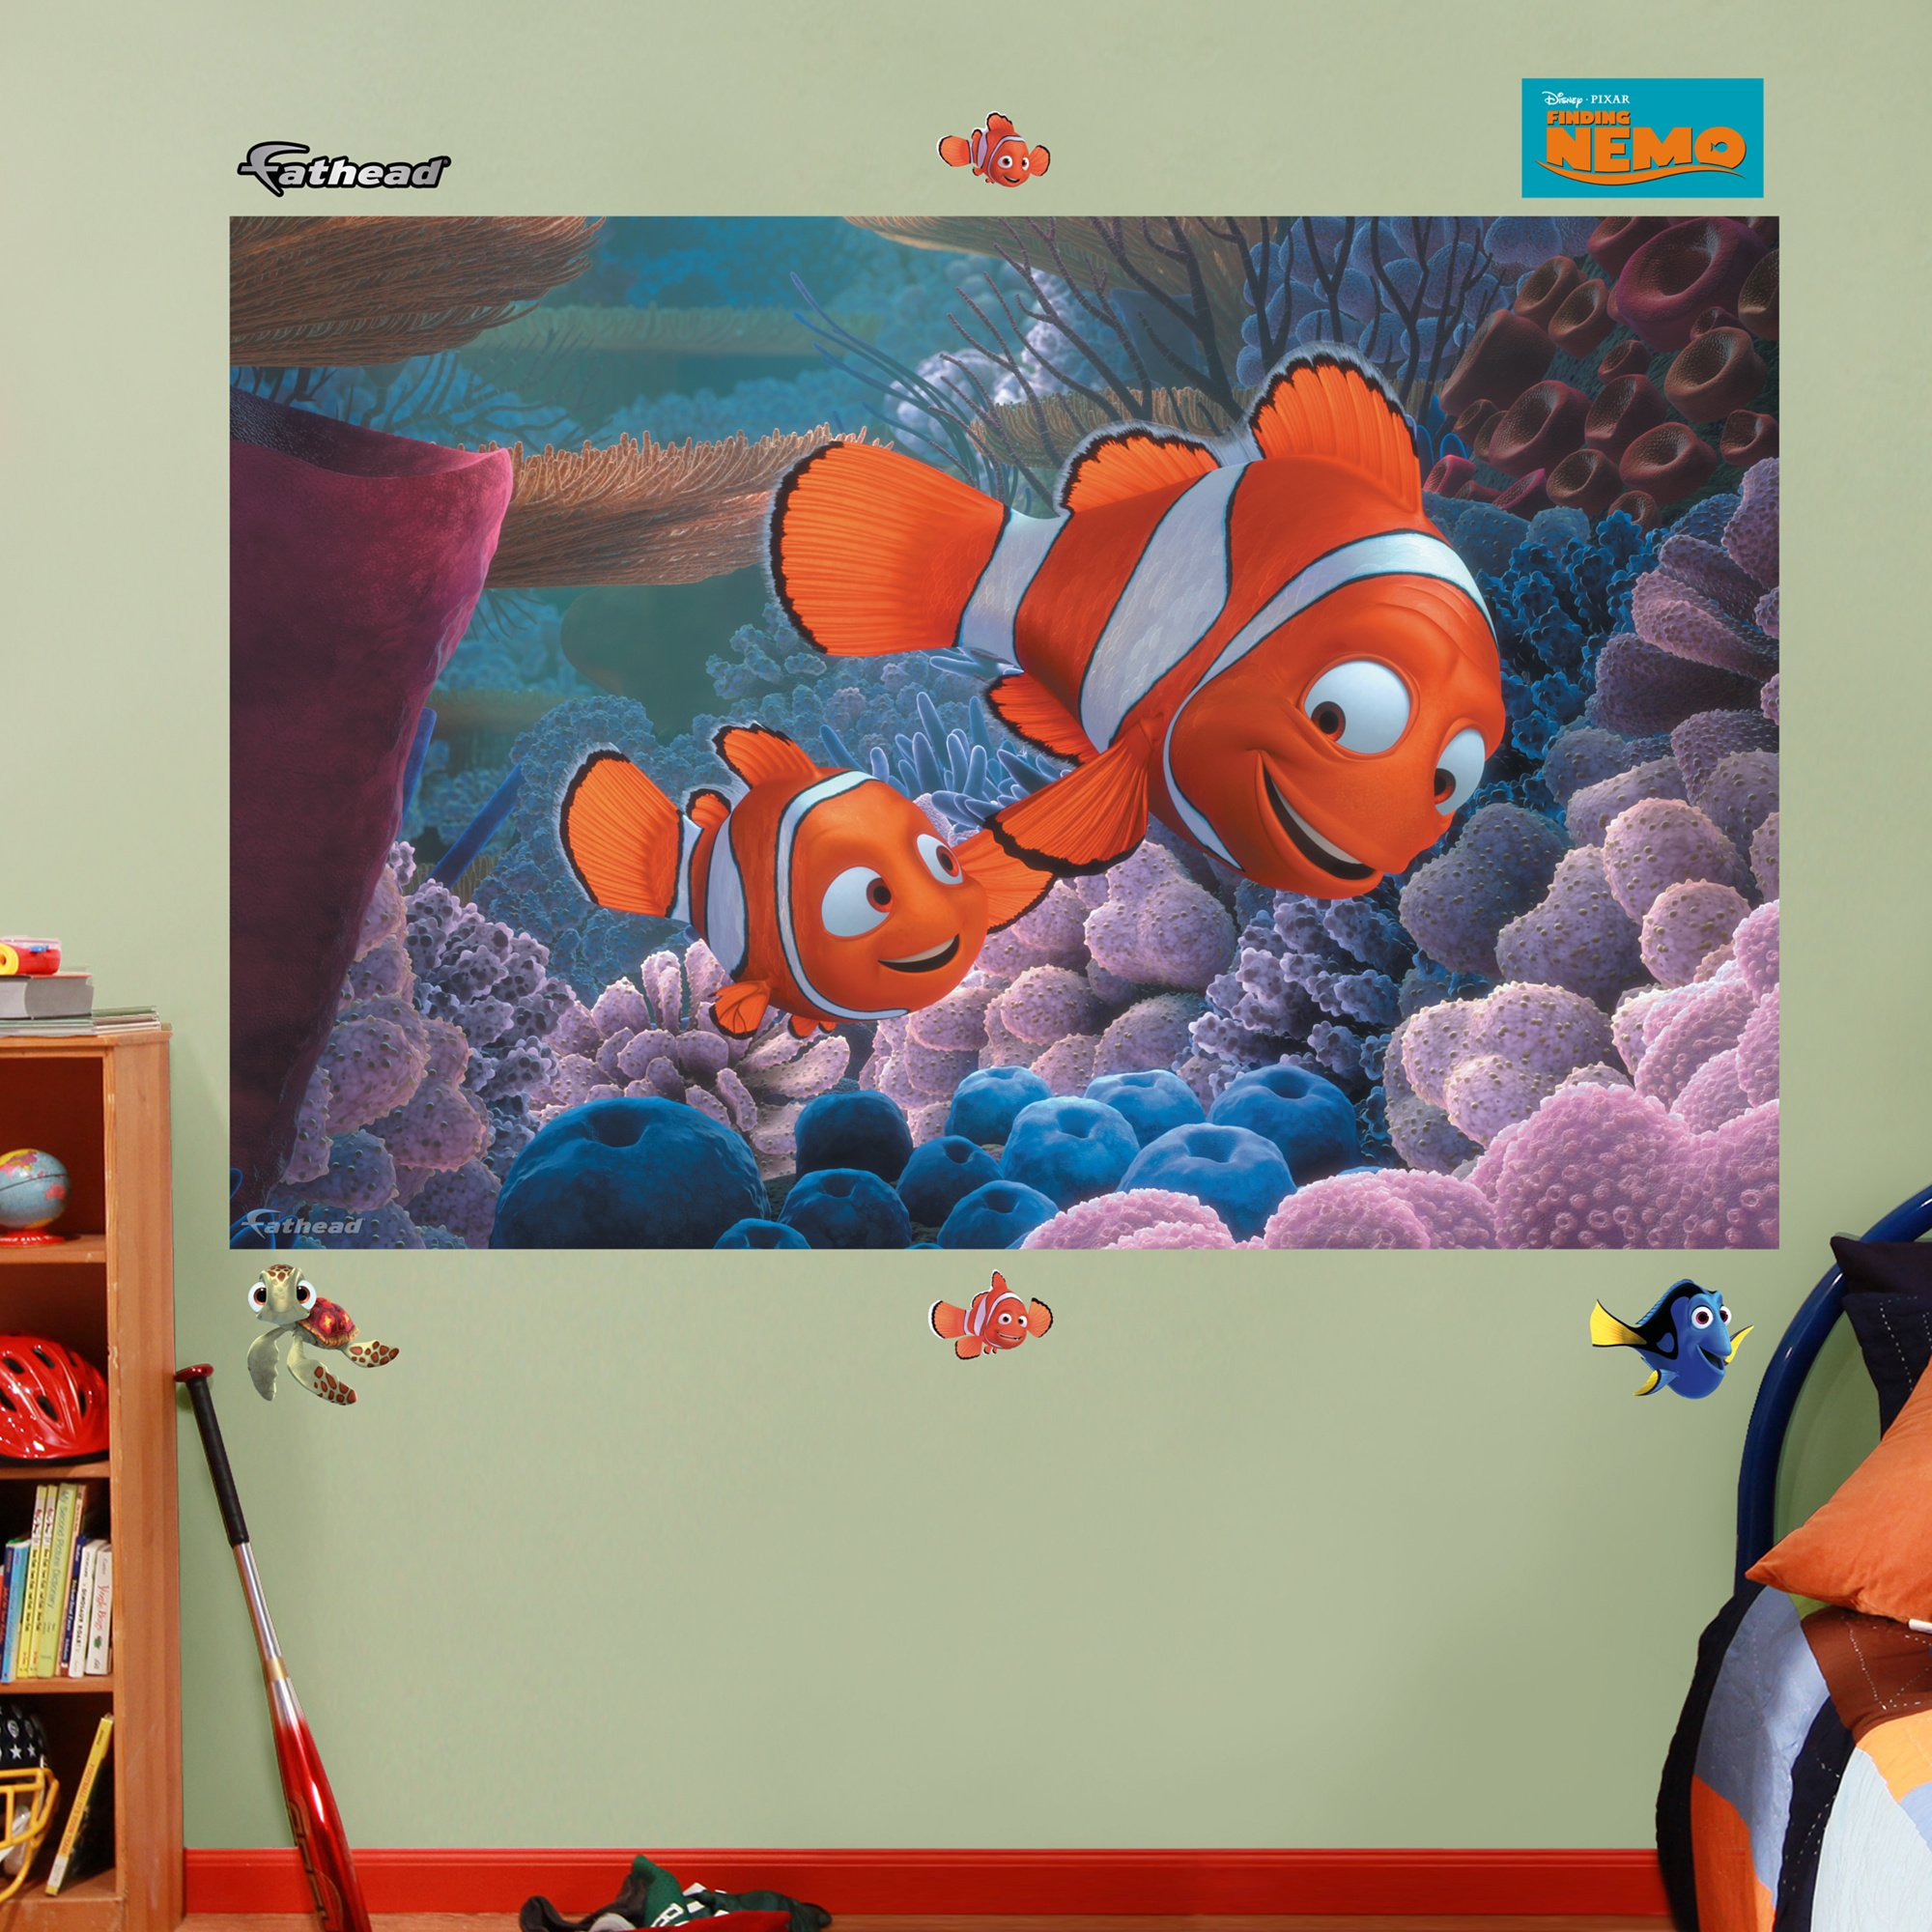 FATHEAD Finding Nemo Mural Graphic Wall Décor